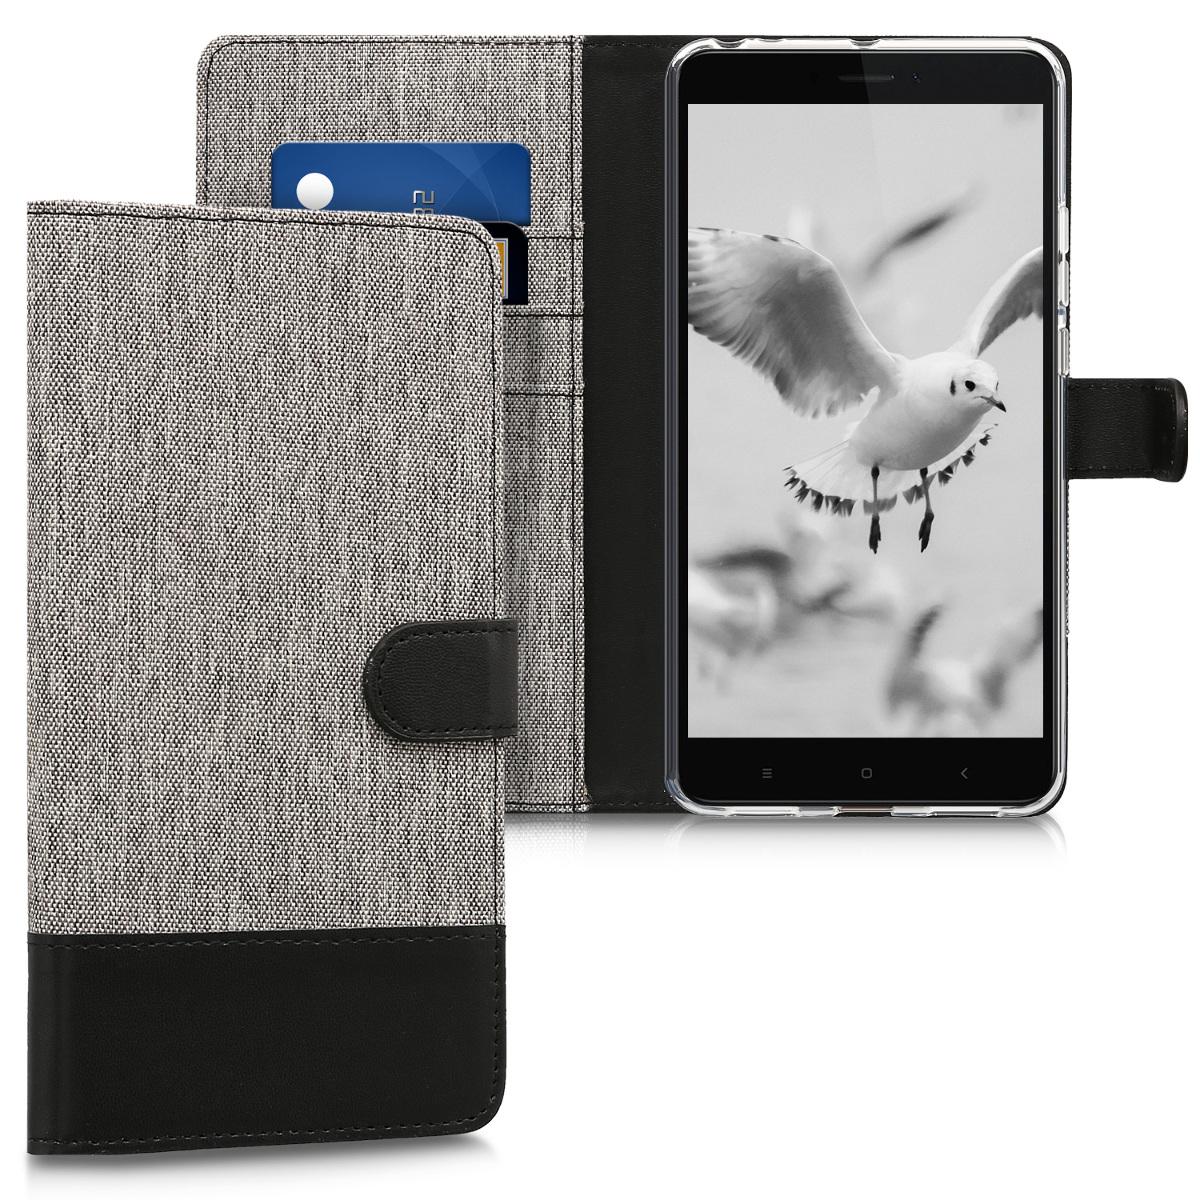 KW Θήκη Πορτοφόλι Xiaomi Mi Max 2 - Grey / Black (43839.22)